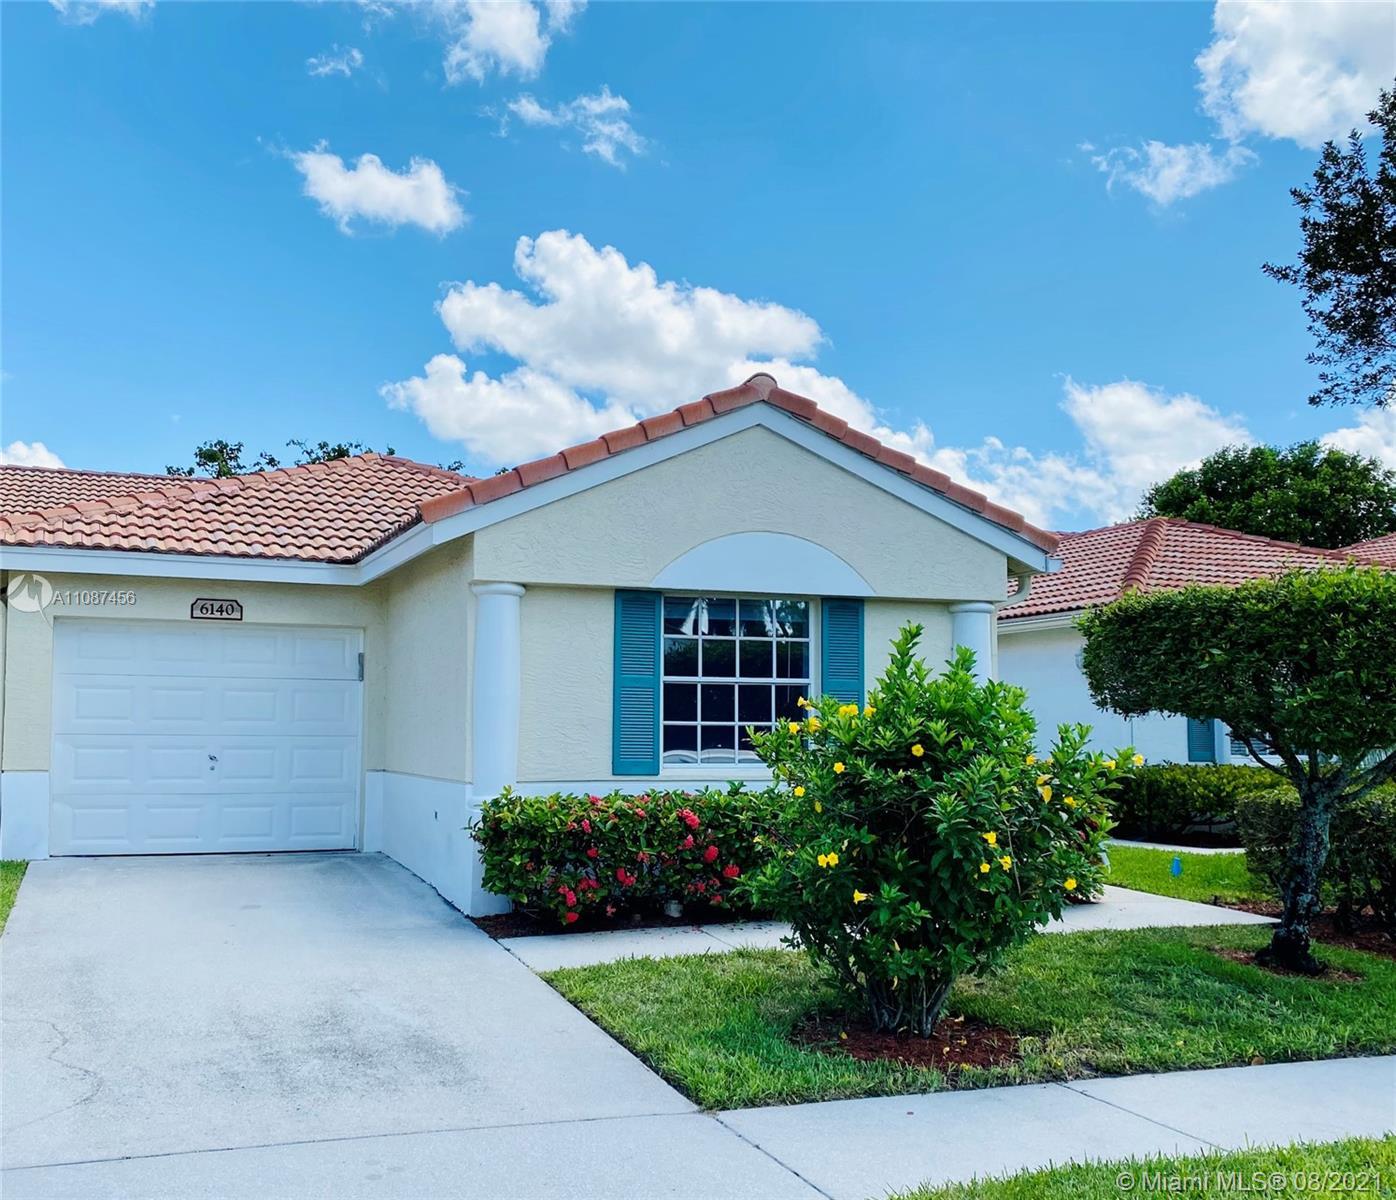 6140 Floral Lakes Dr Unit 6140, Delray Beach, Florida 33484